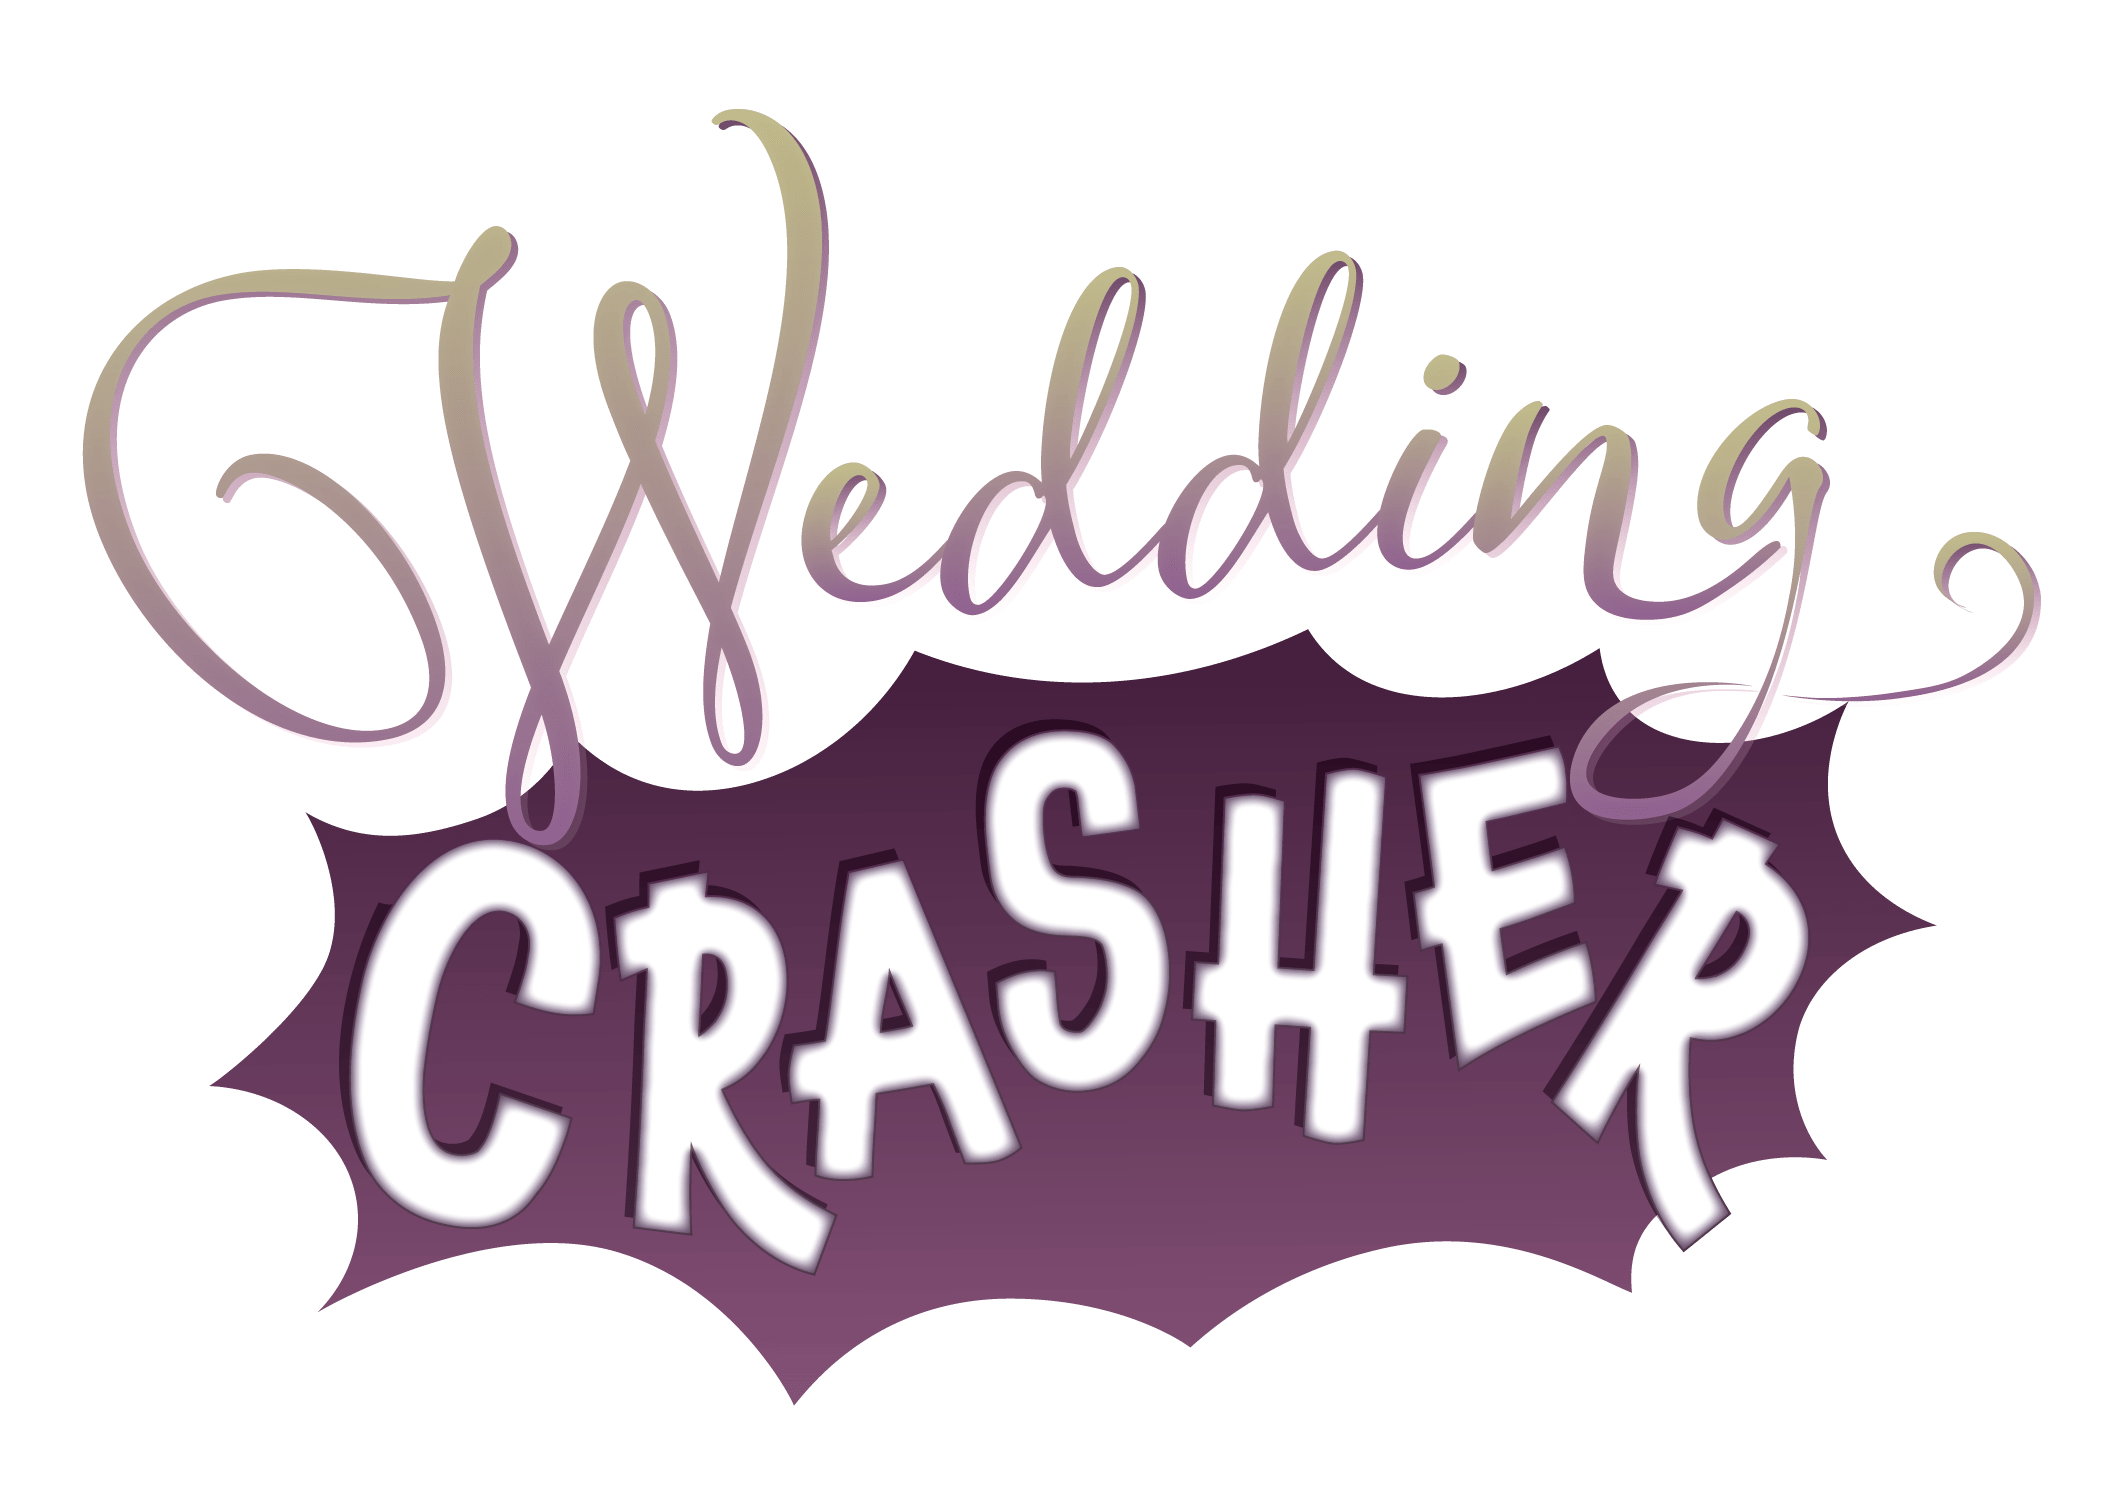 StrainLogo_WeddingCrasher_color2